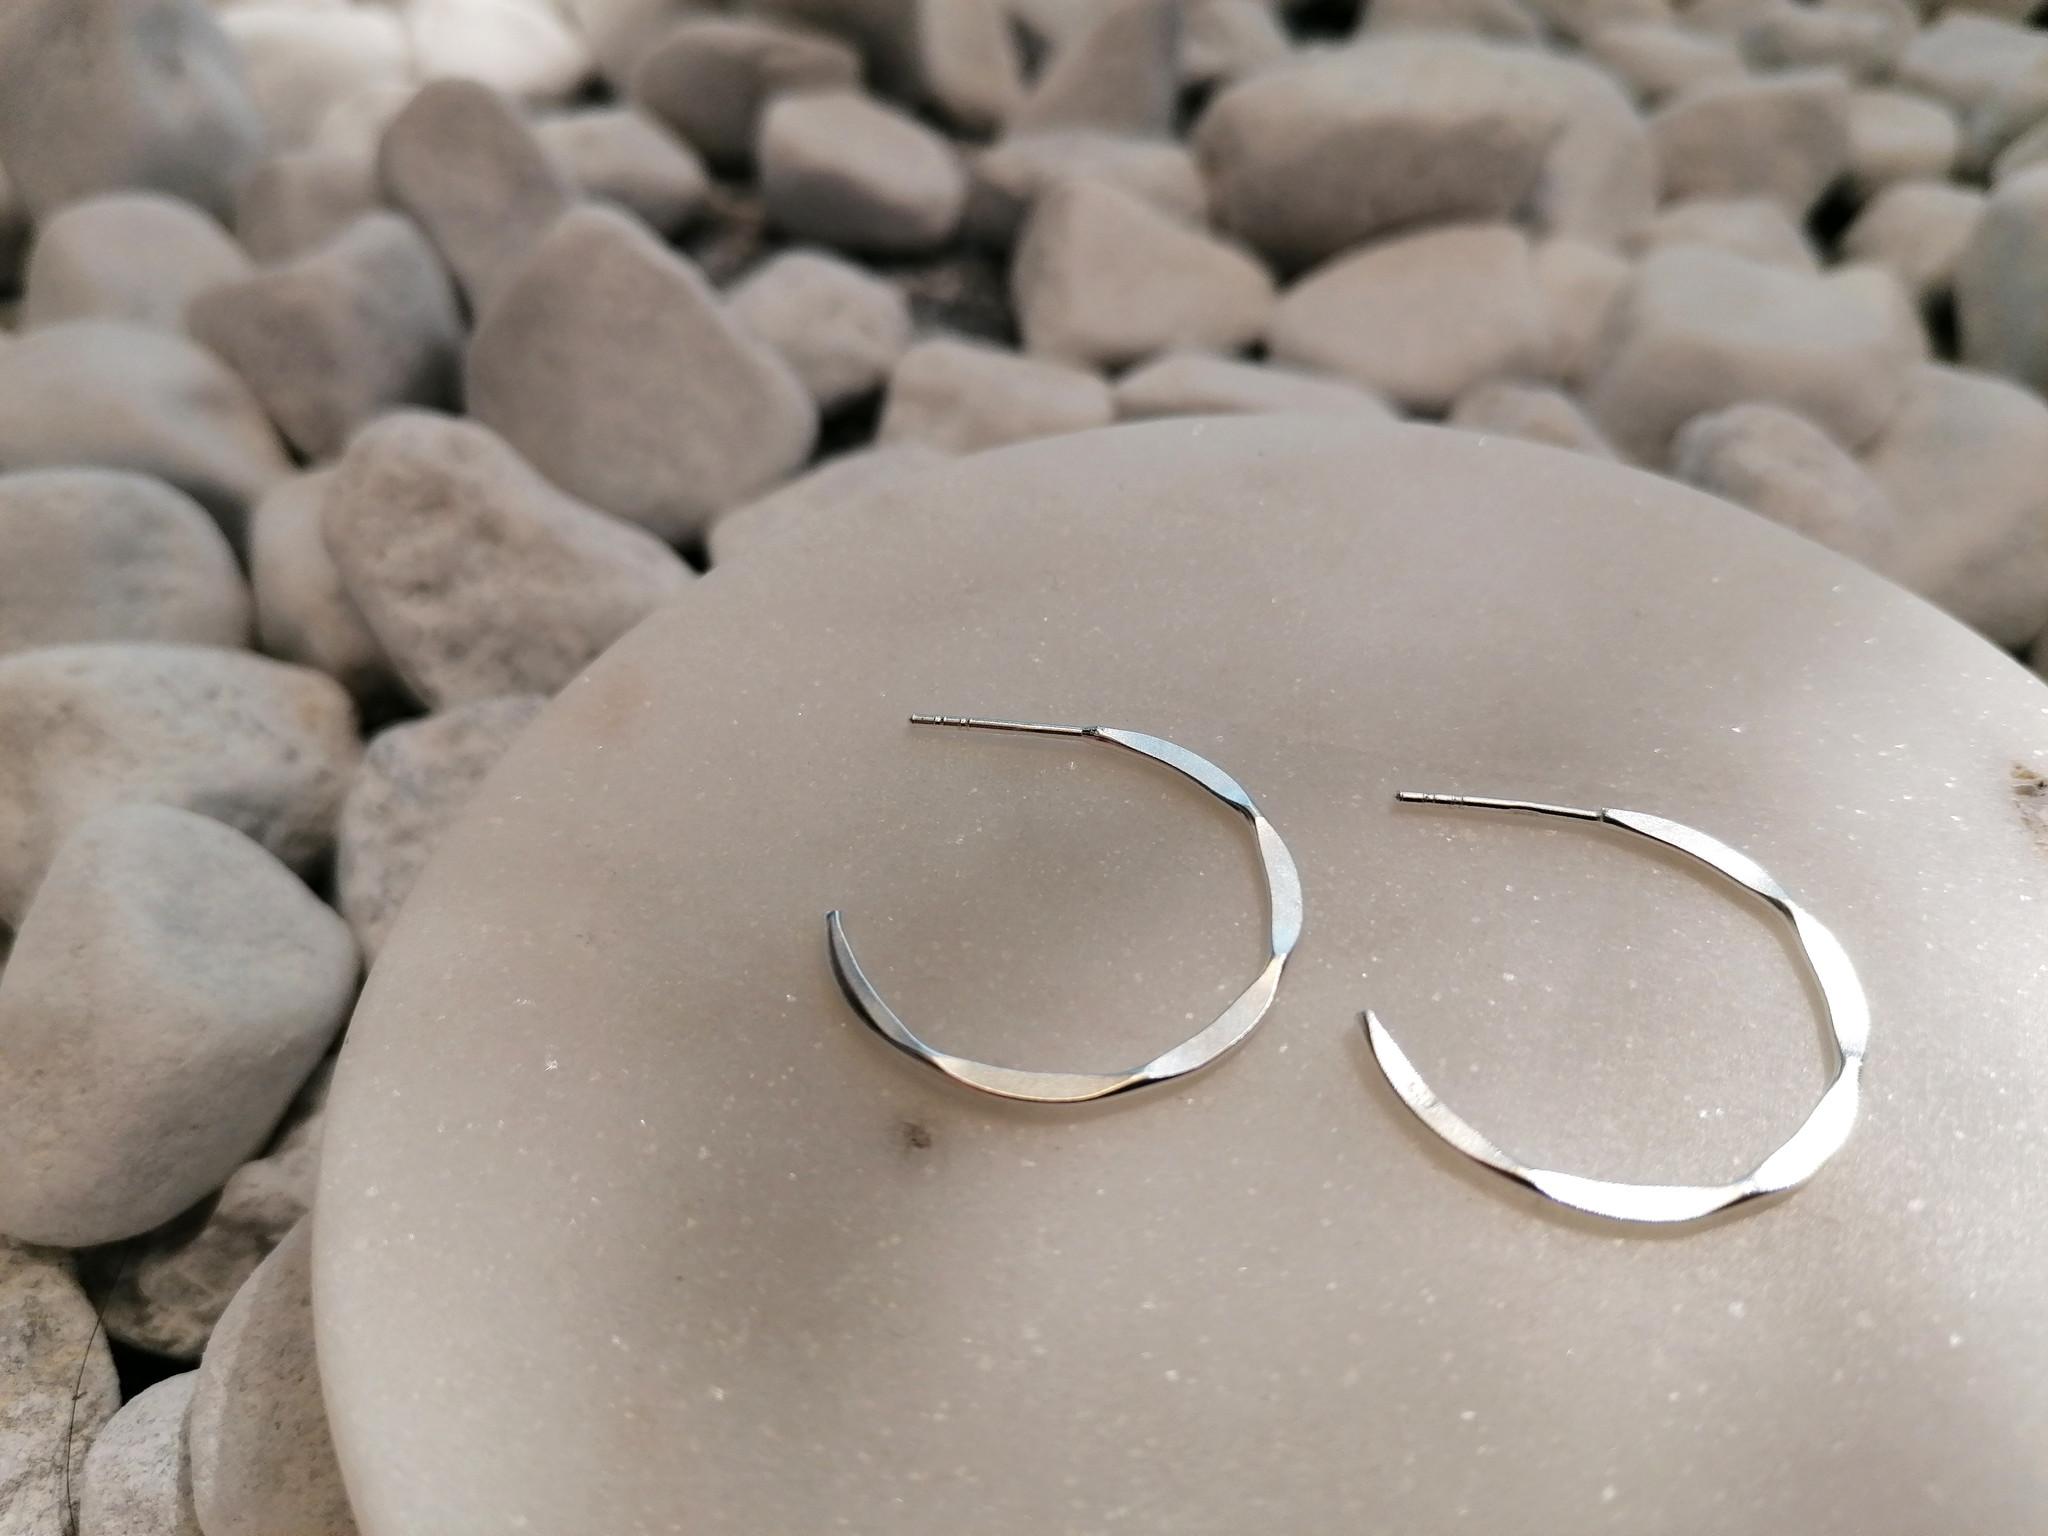 Large Hoop Earrings with texture - 925er Sterling Silver-4